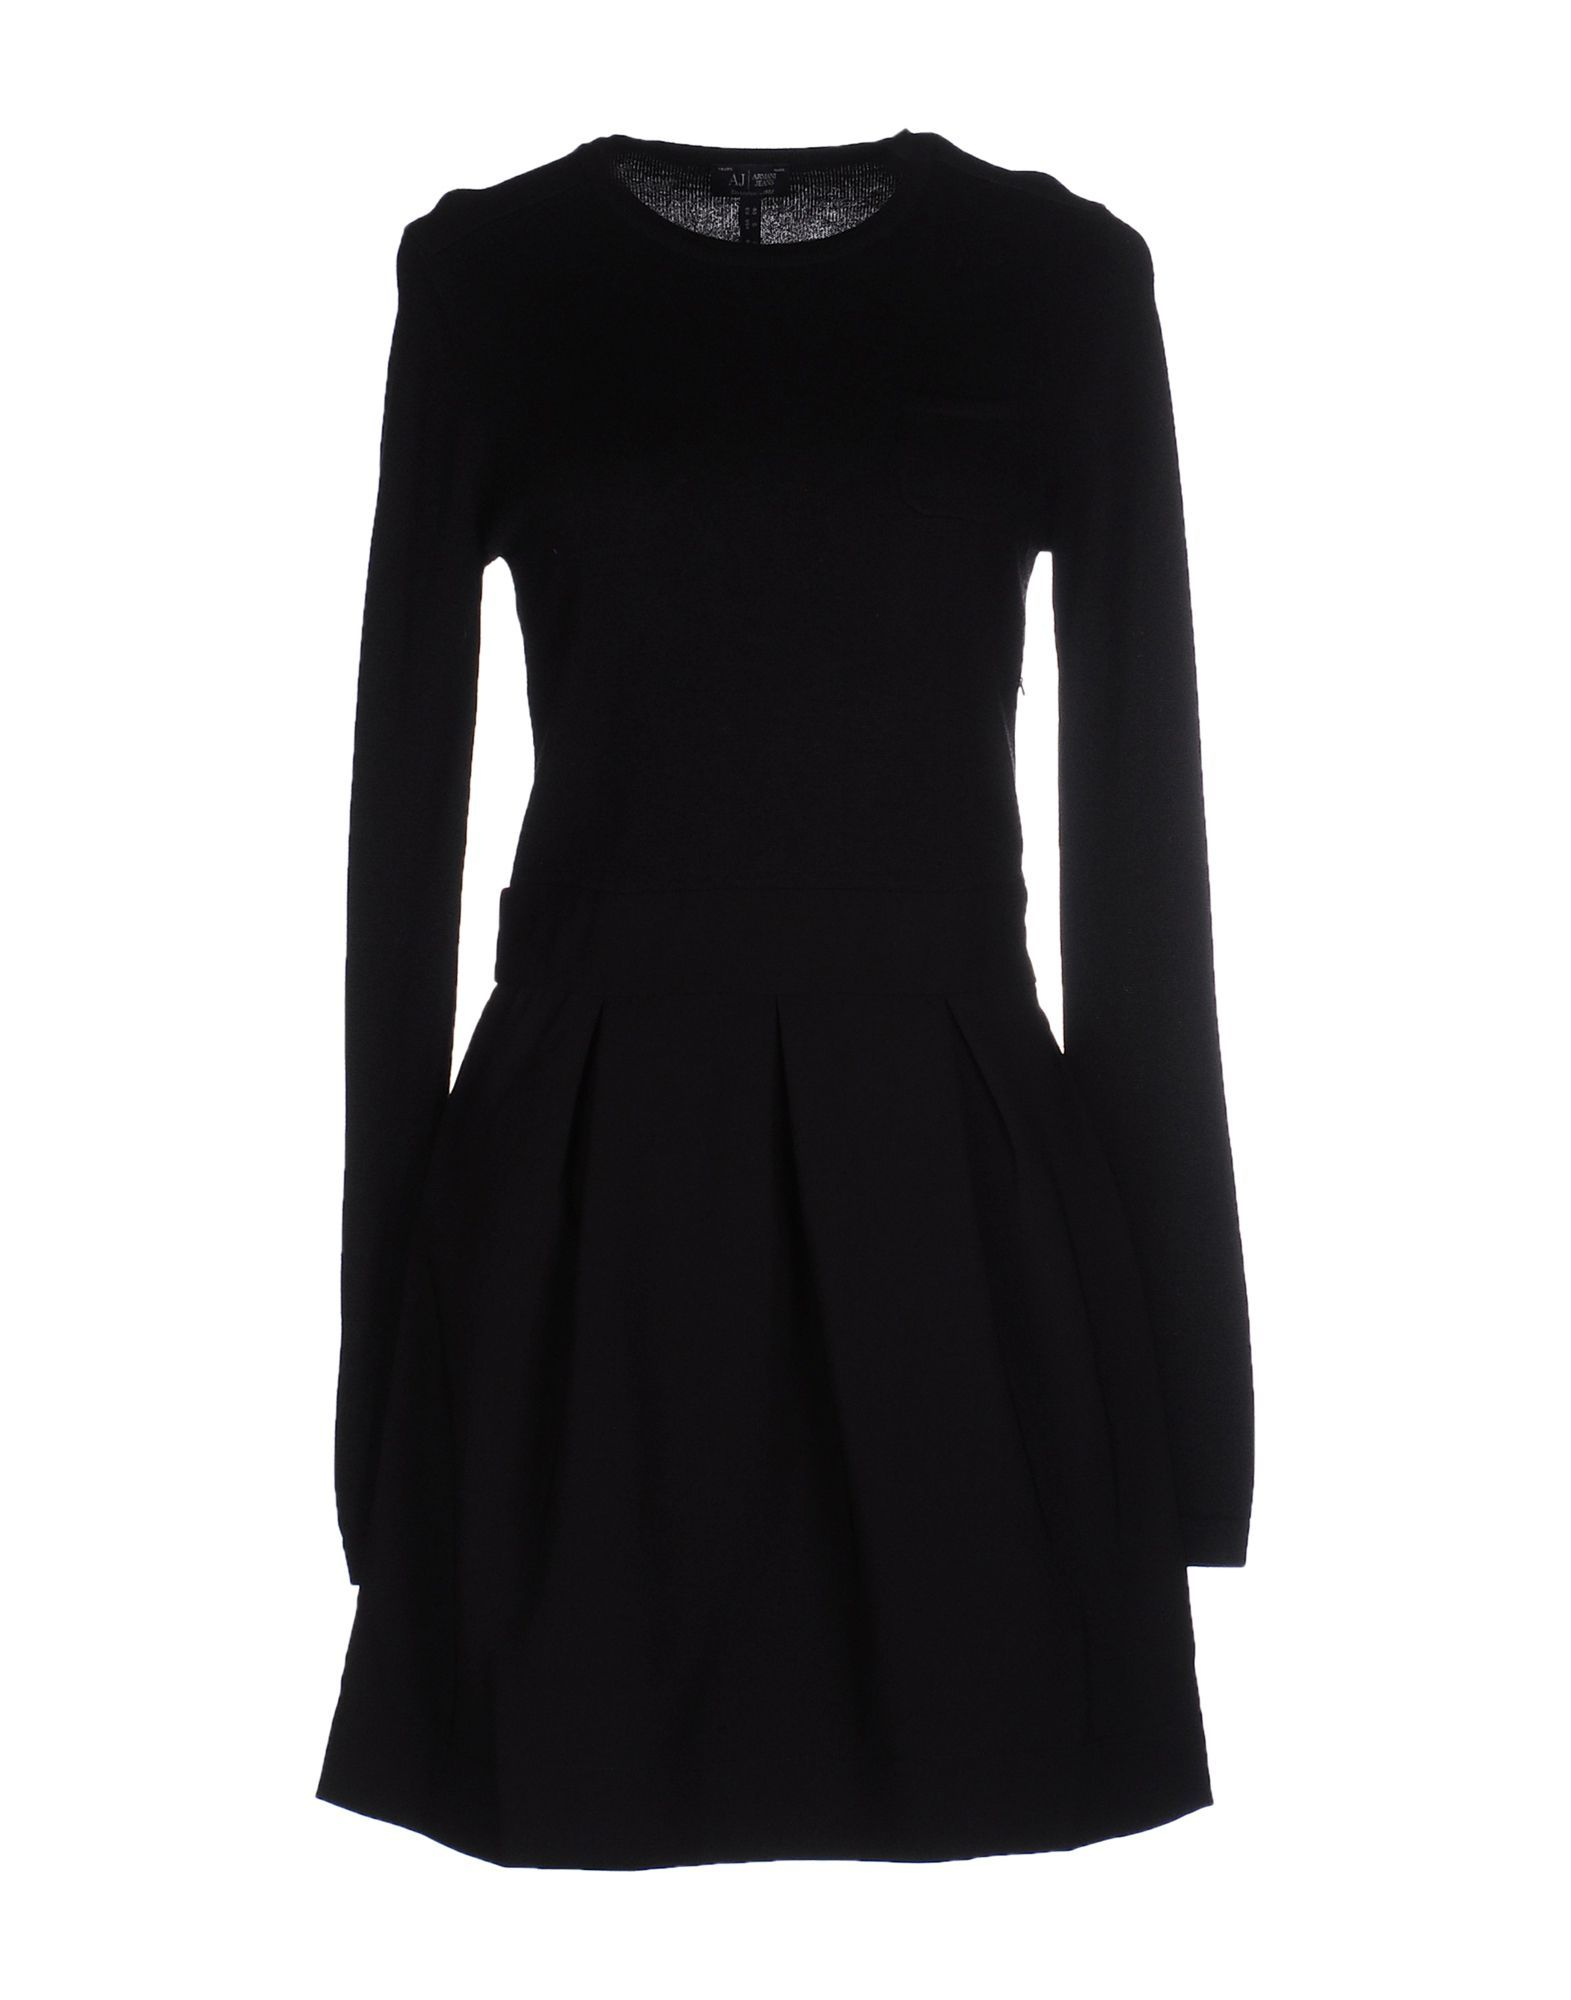 Armani Jeans Black Long Sleeve Dress